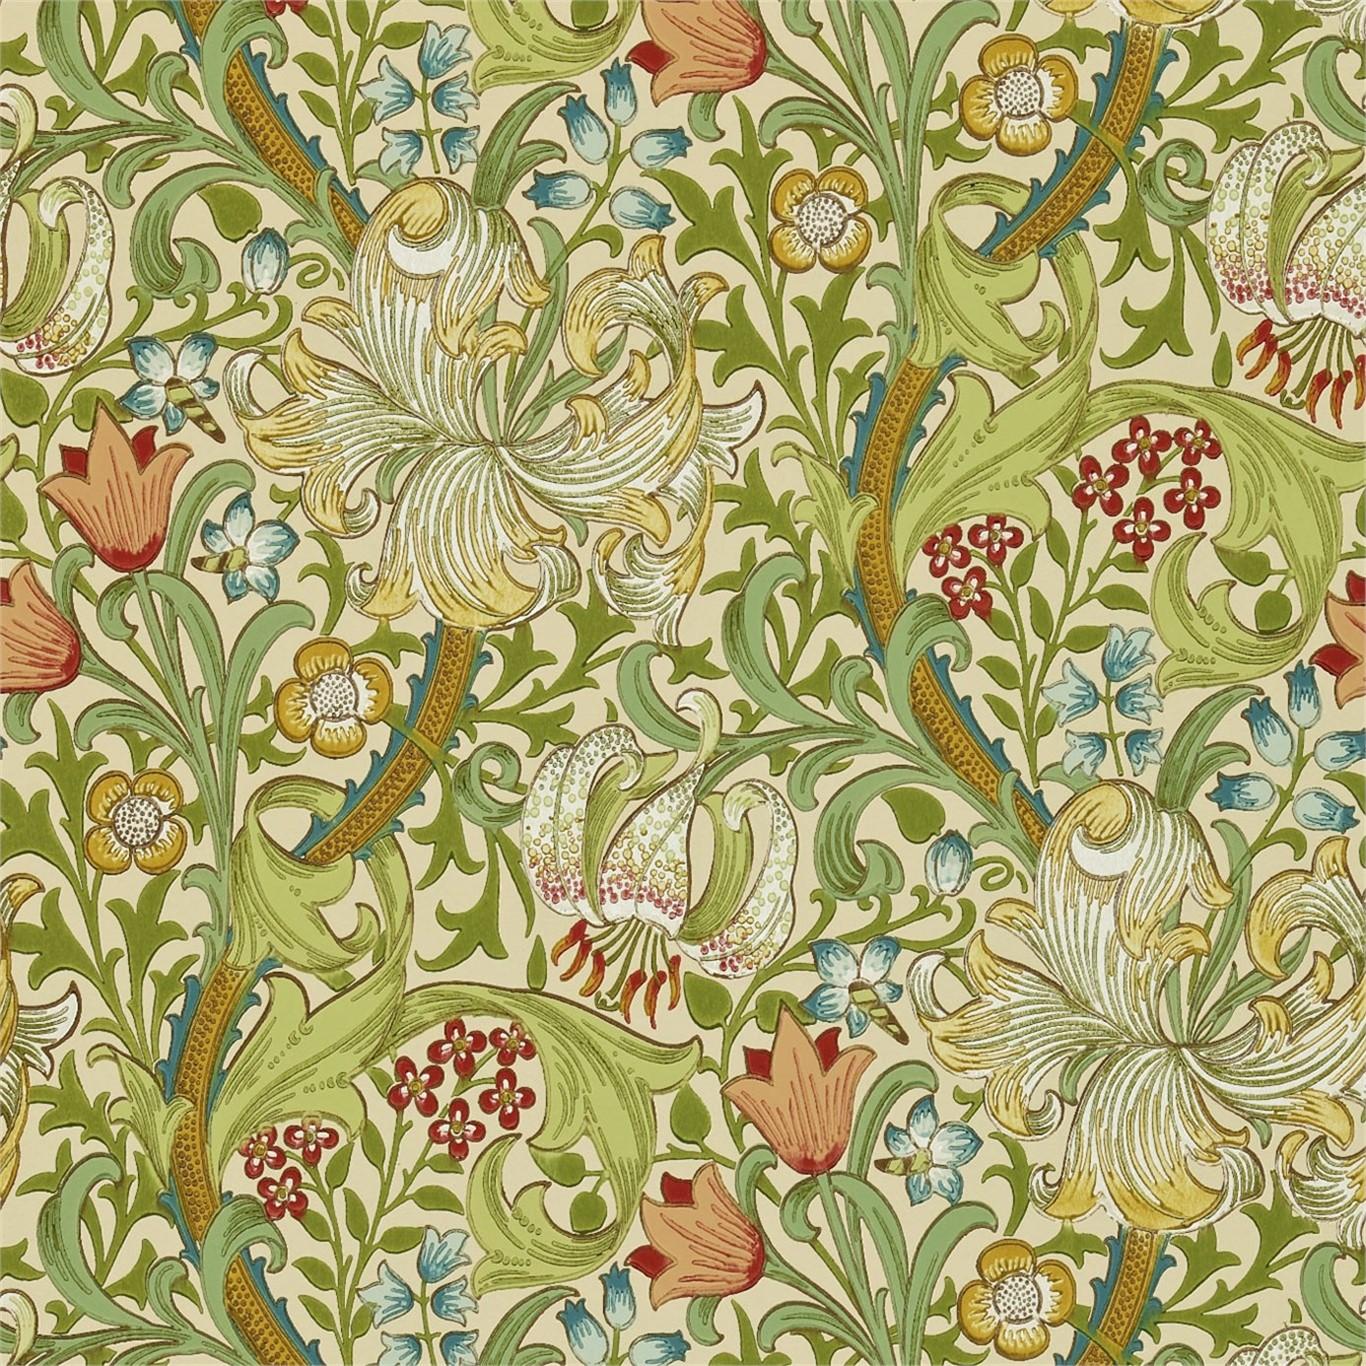 Tapet William Morris Golden Lily 216464